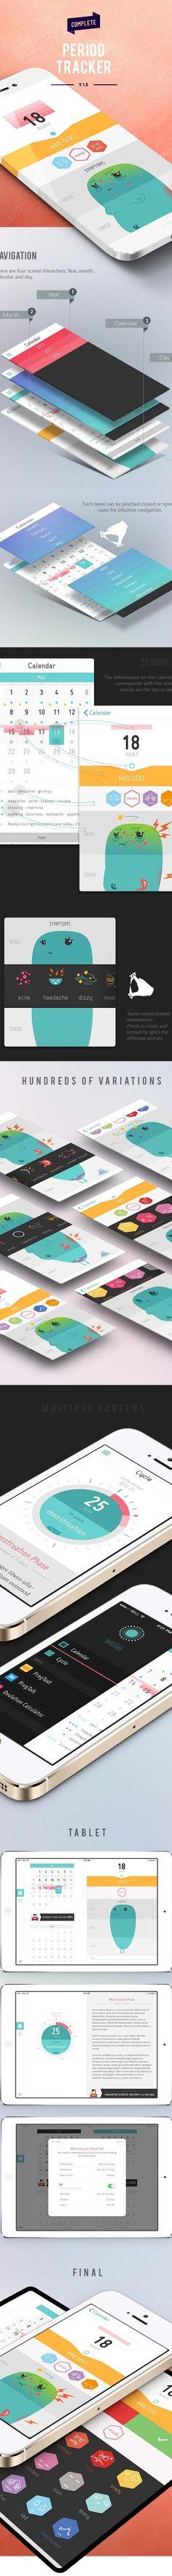 Mobile UI Design Inspiration #10 #ui #interfacedesign #ux